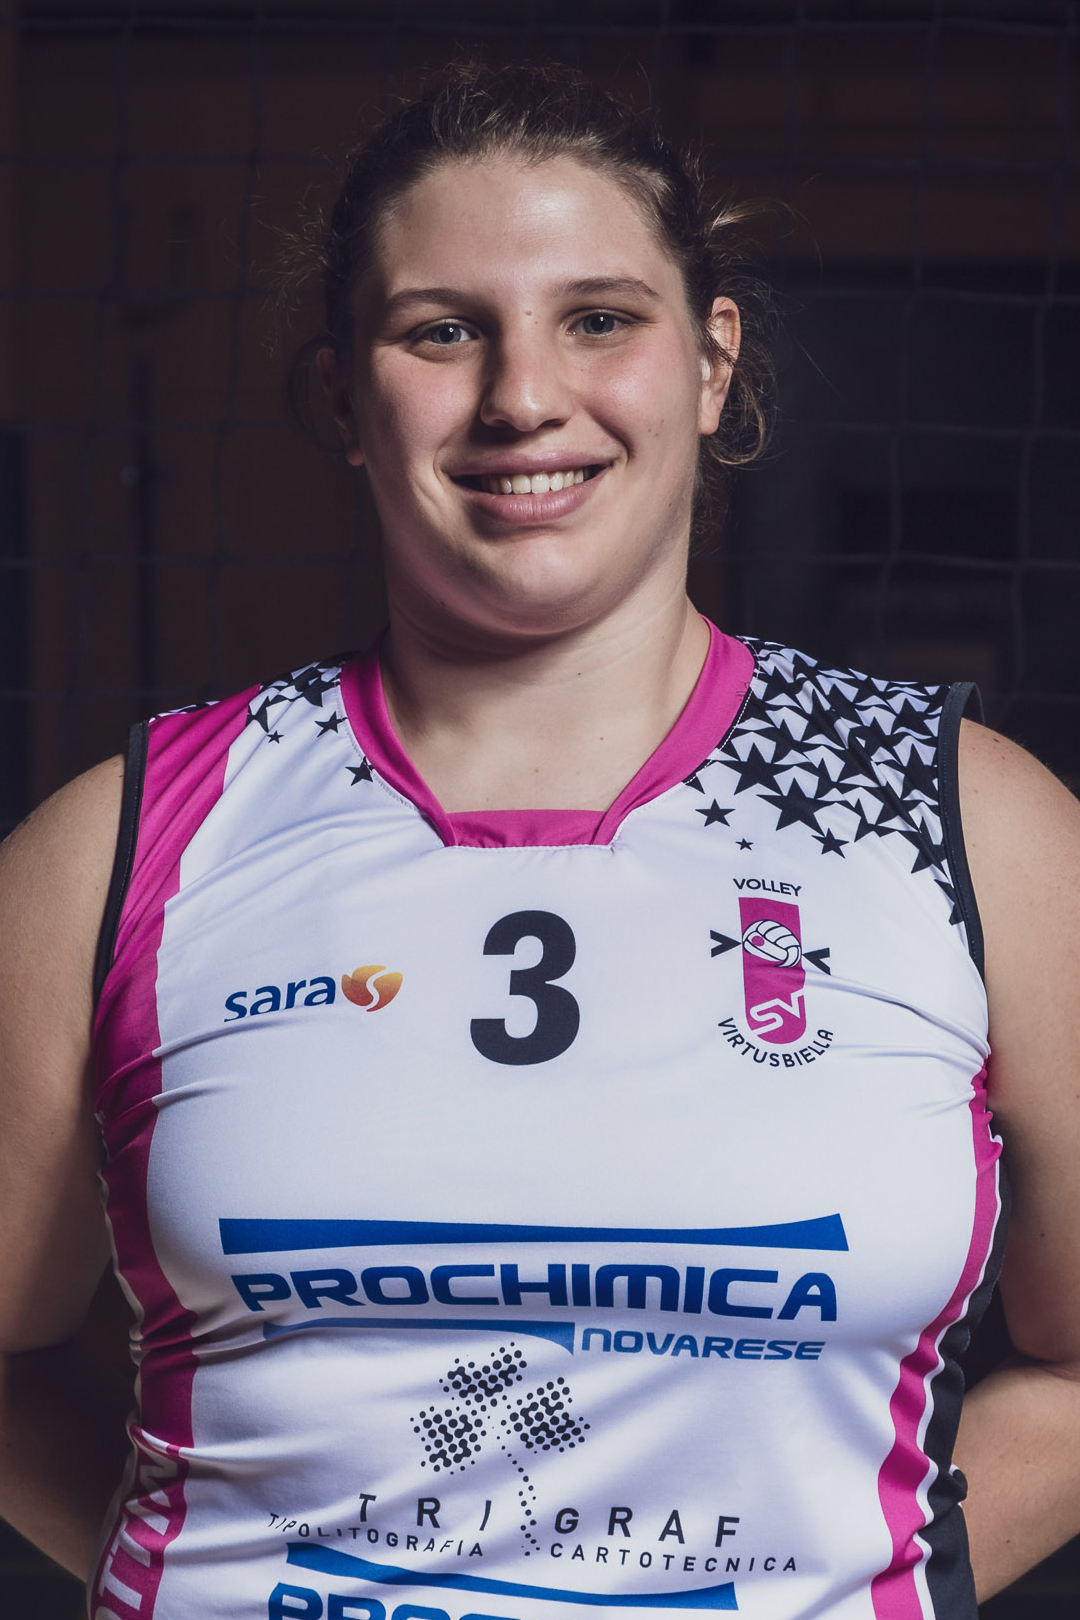 3 – Cristina Mariottini